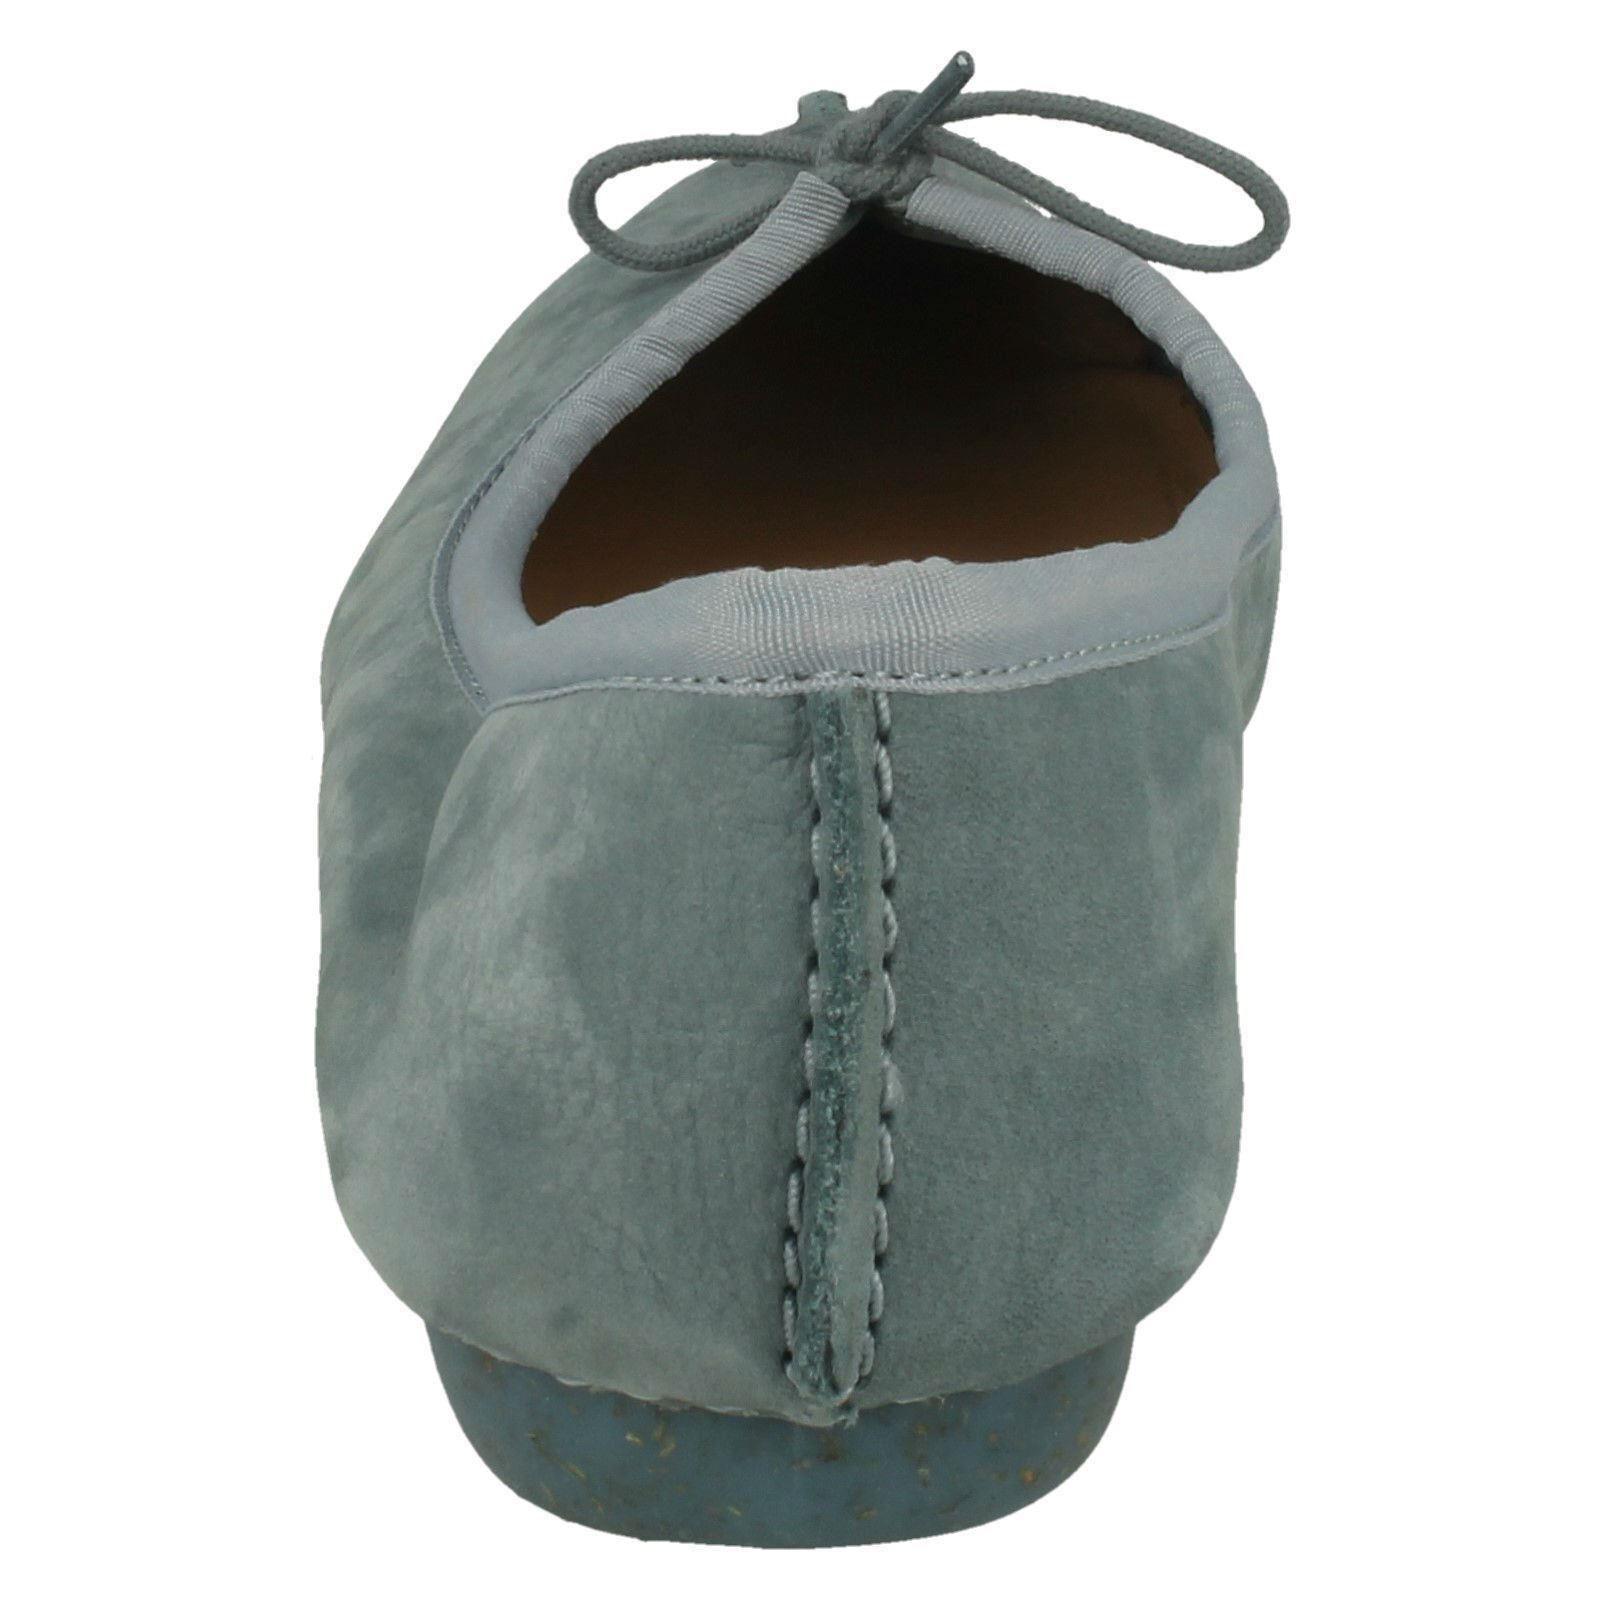 LADIES CLARKS Schuhe UNSTRUCTUROT SLIP ON BOW CASUAL BALLERINA FLAT Schuhe CLARKS FRECKLE ICE e1794b